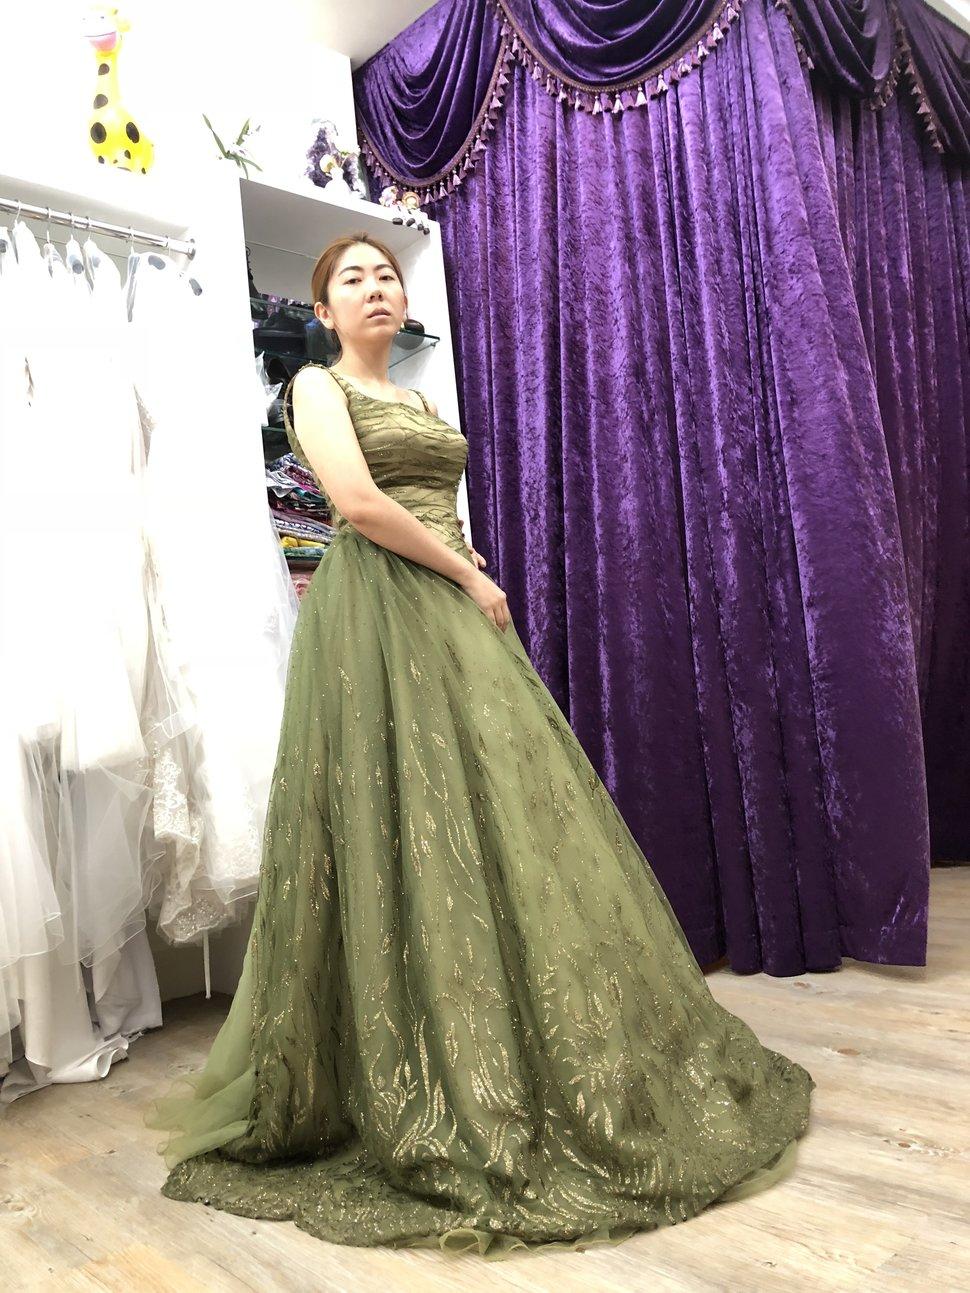 IMG_5949 - 全台最便宜-45DESIGN四五婚紗禮服《結婚吧》